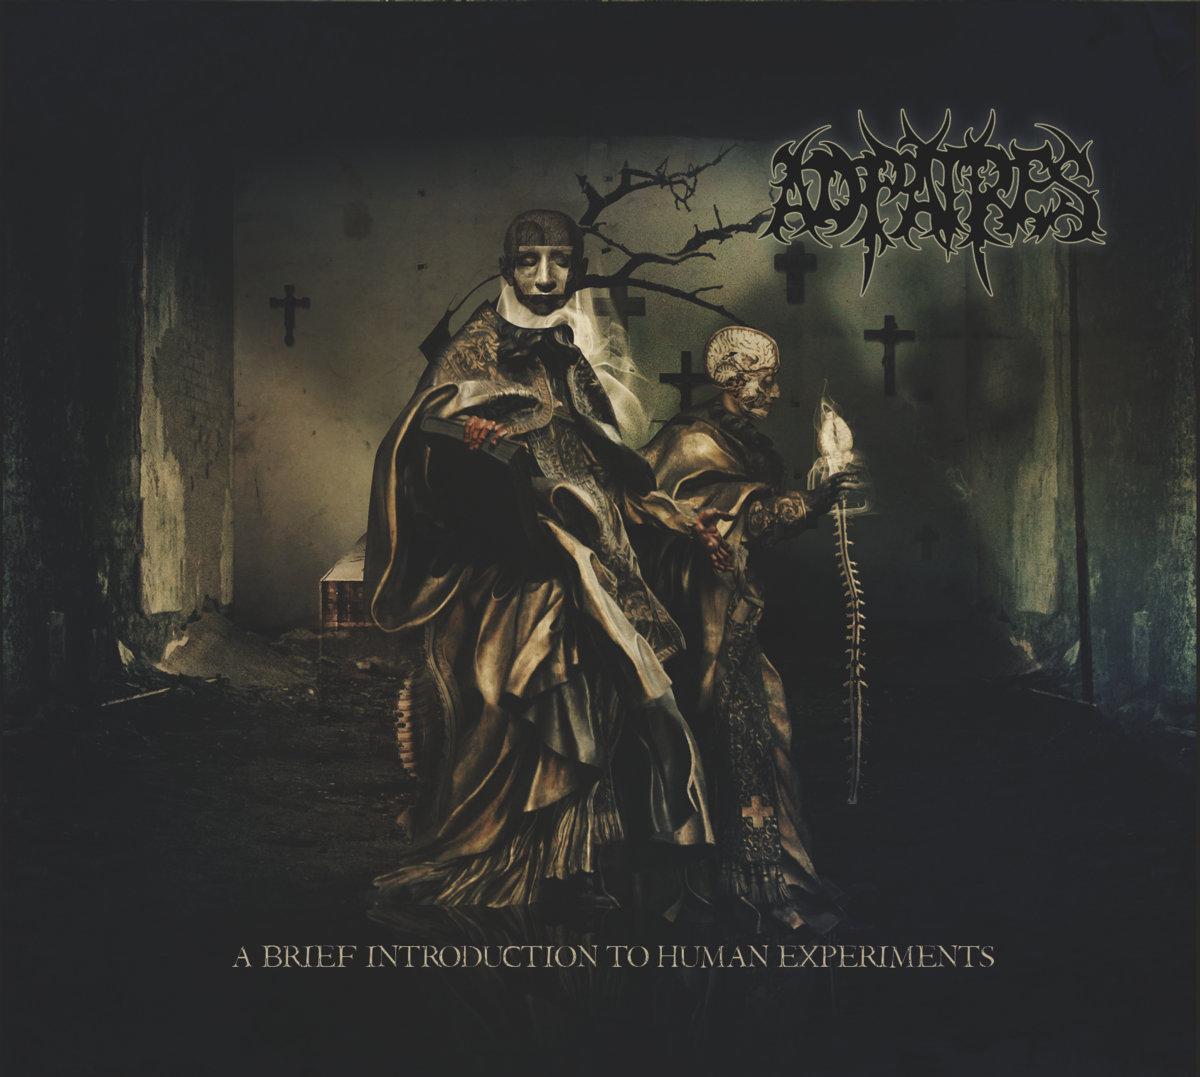 ad patres death metal français